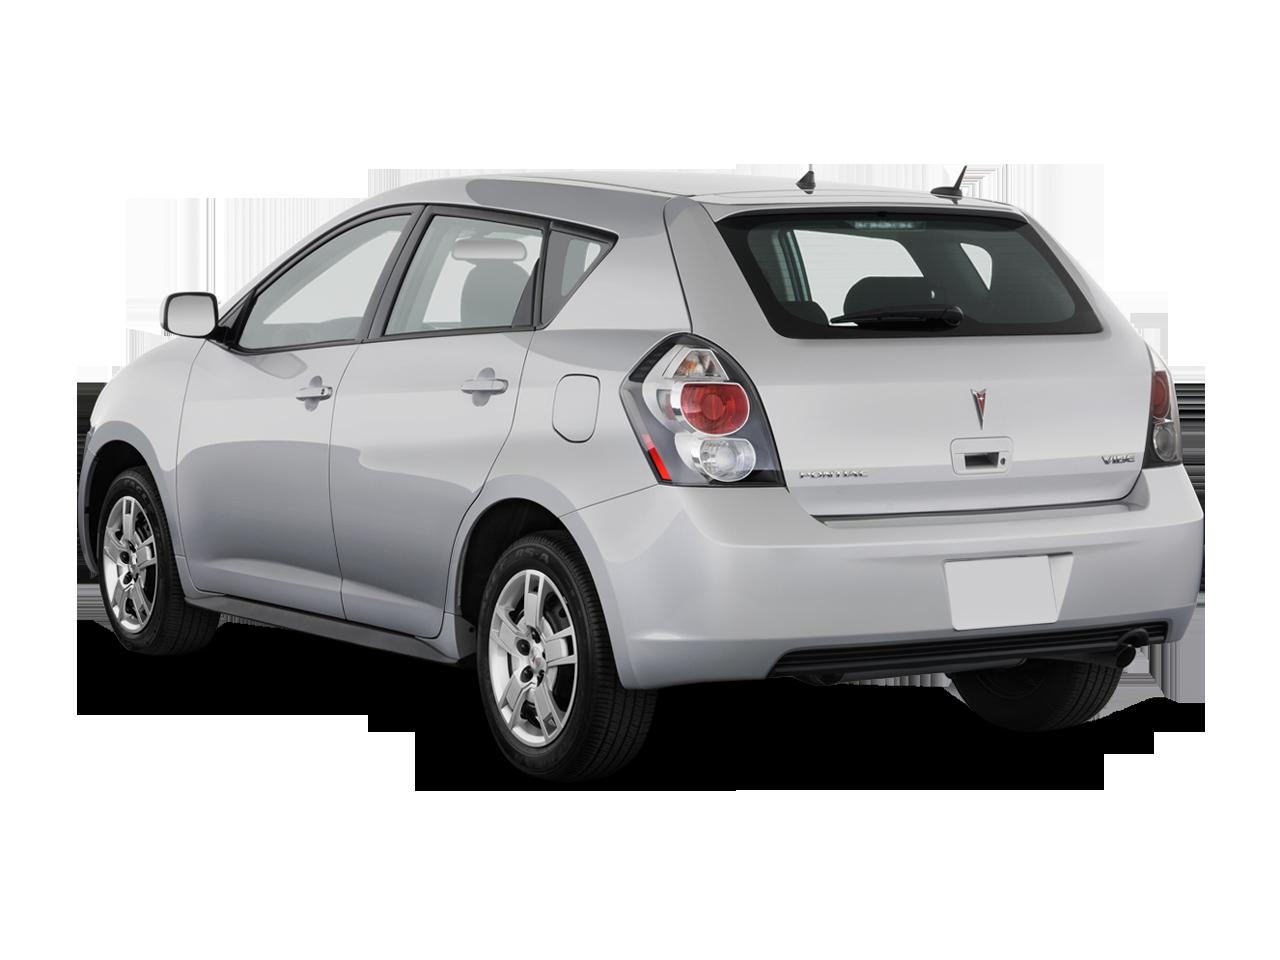 Pontiac 2002 pontiac vibe : 2006 Pontiac Vibe - Intellichoice Review - Automobile Magazine